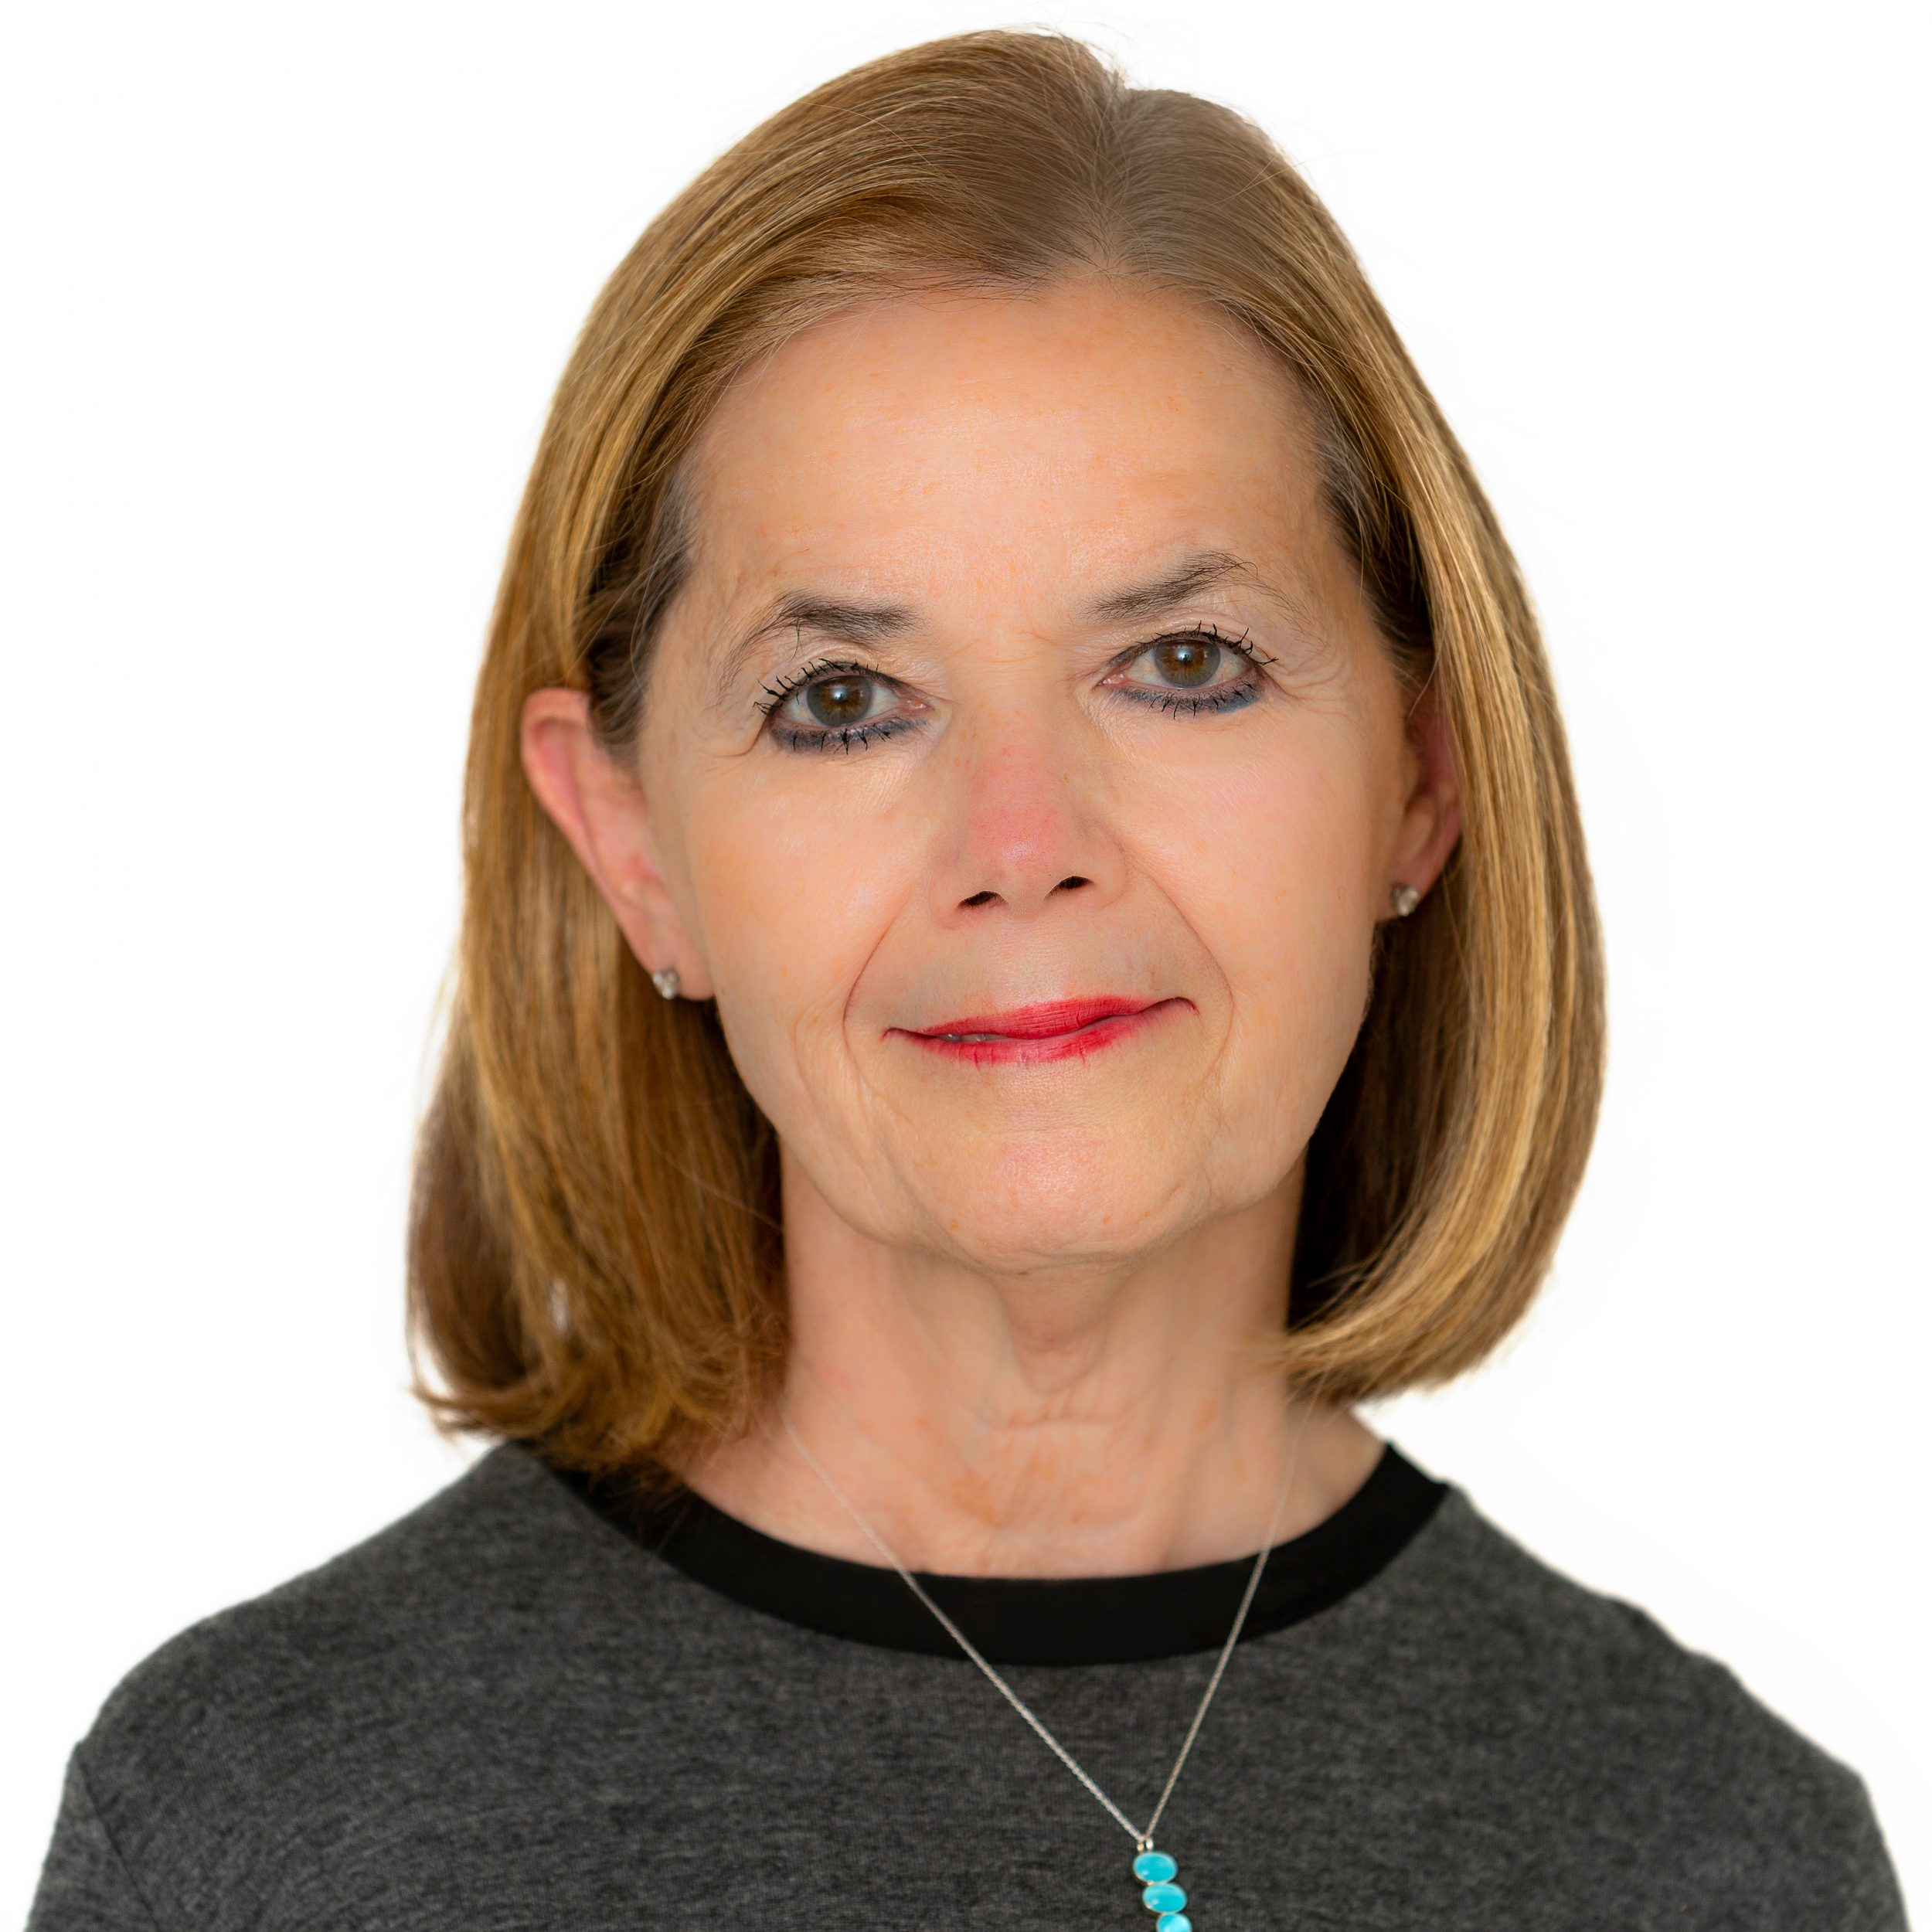 Linda Baranovics